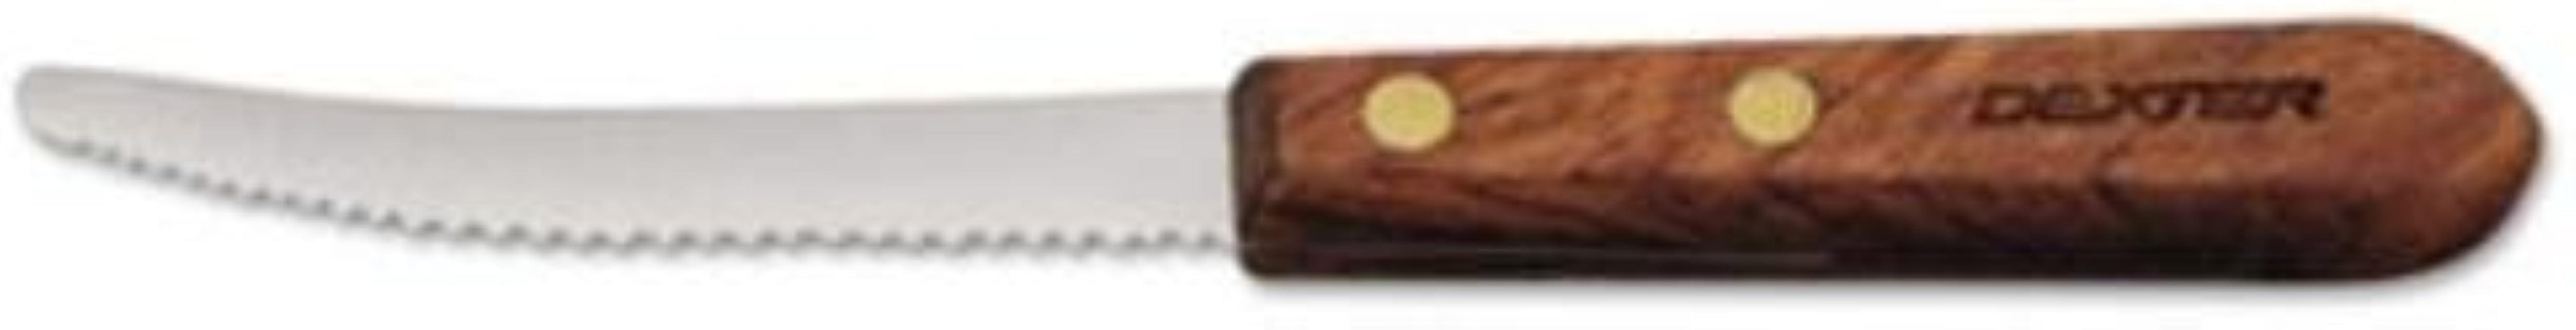 3 Scalloped Grapefruit Knife